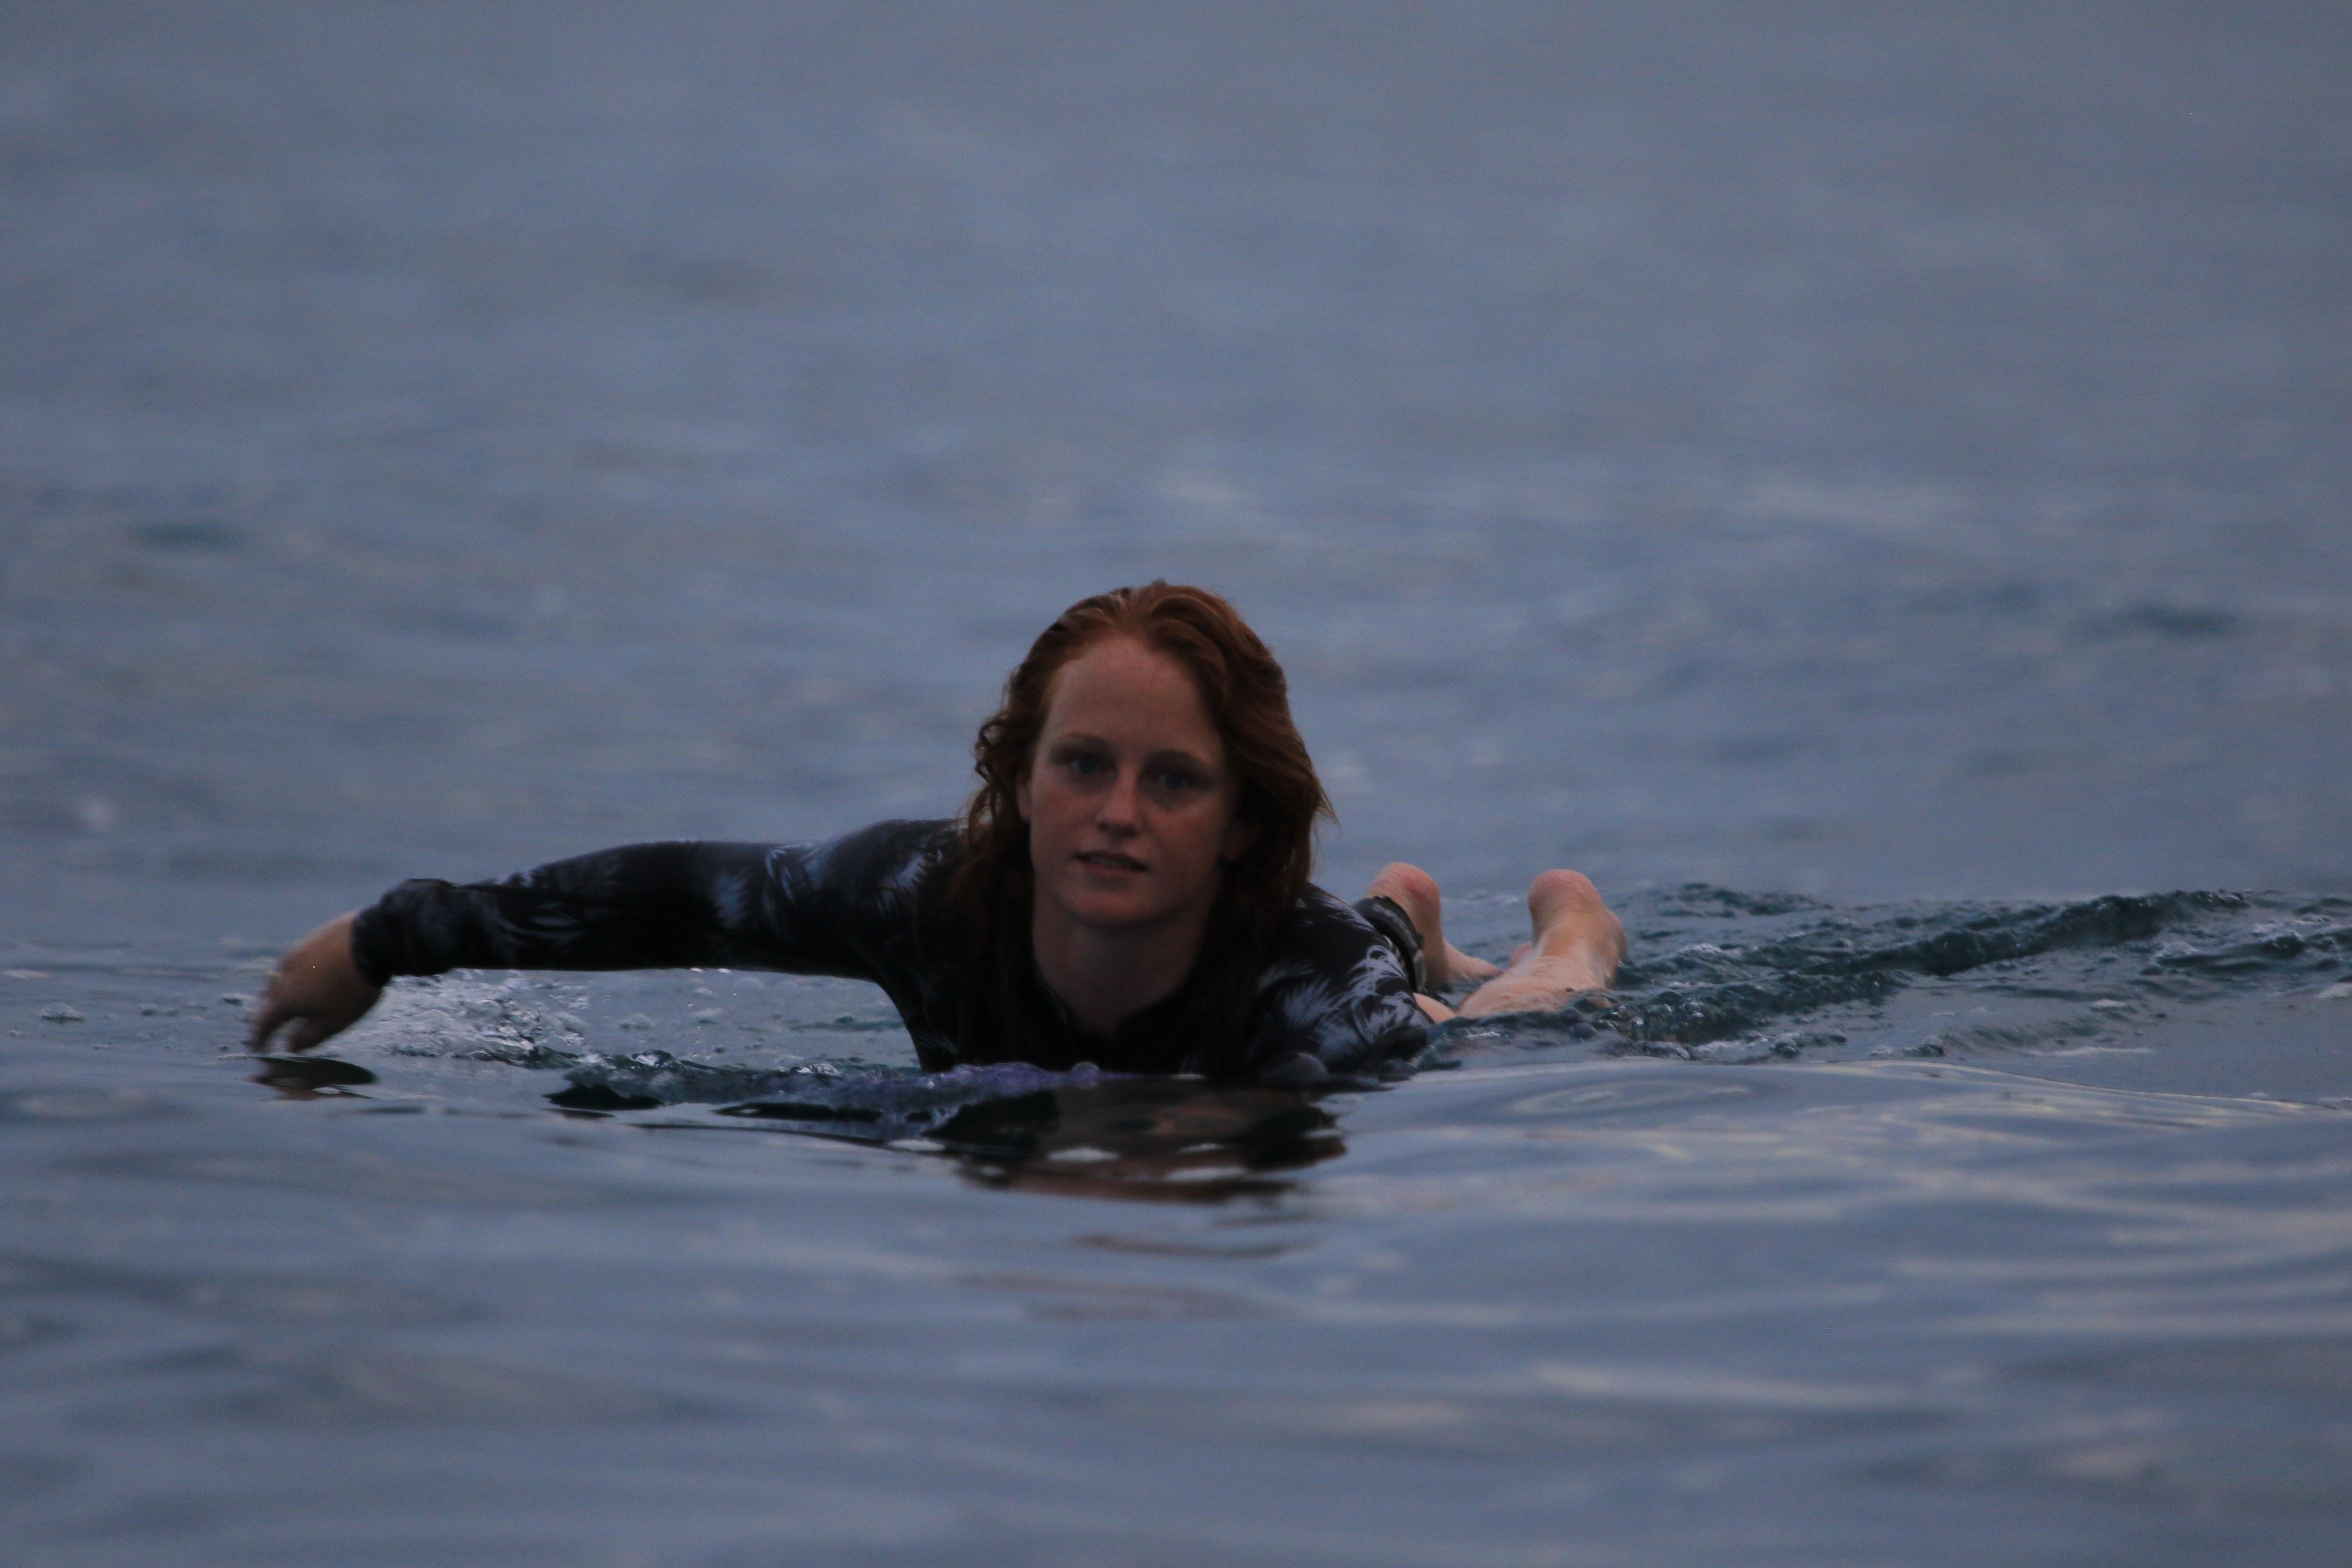 Grace Doyle. The lady herself. Billabong Team Rider. Female Pro Surfer.